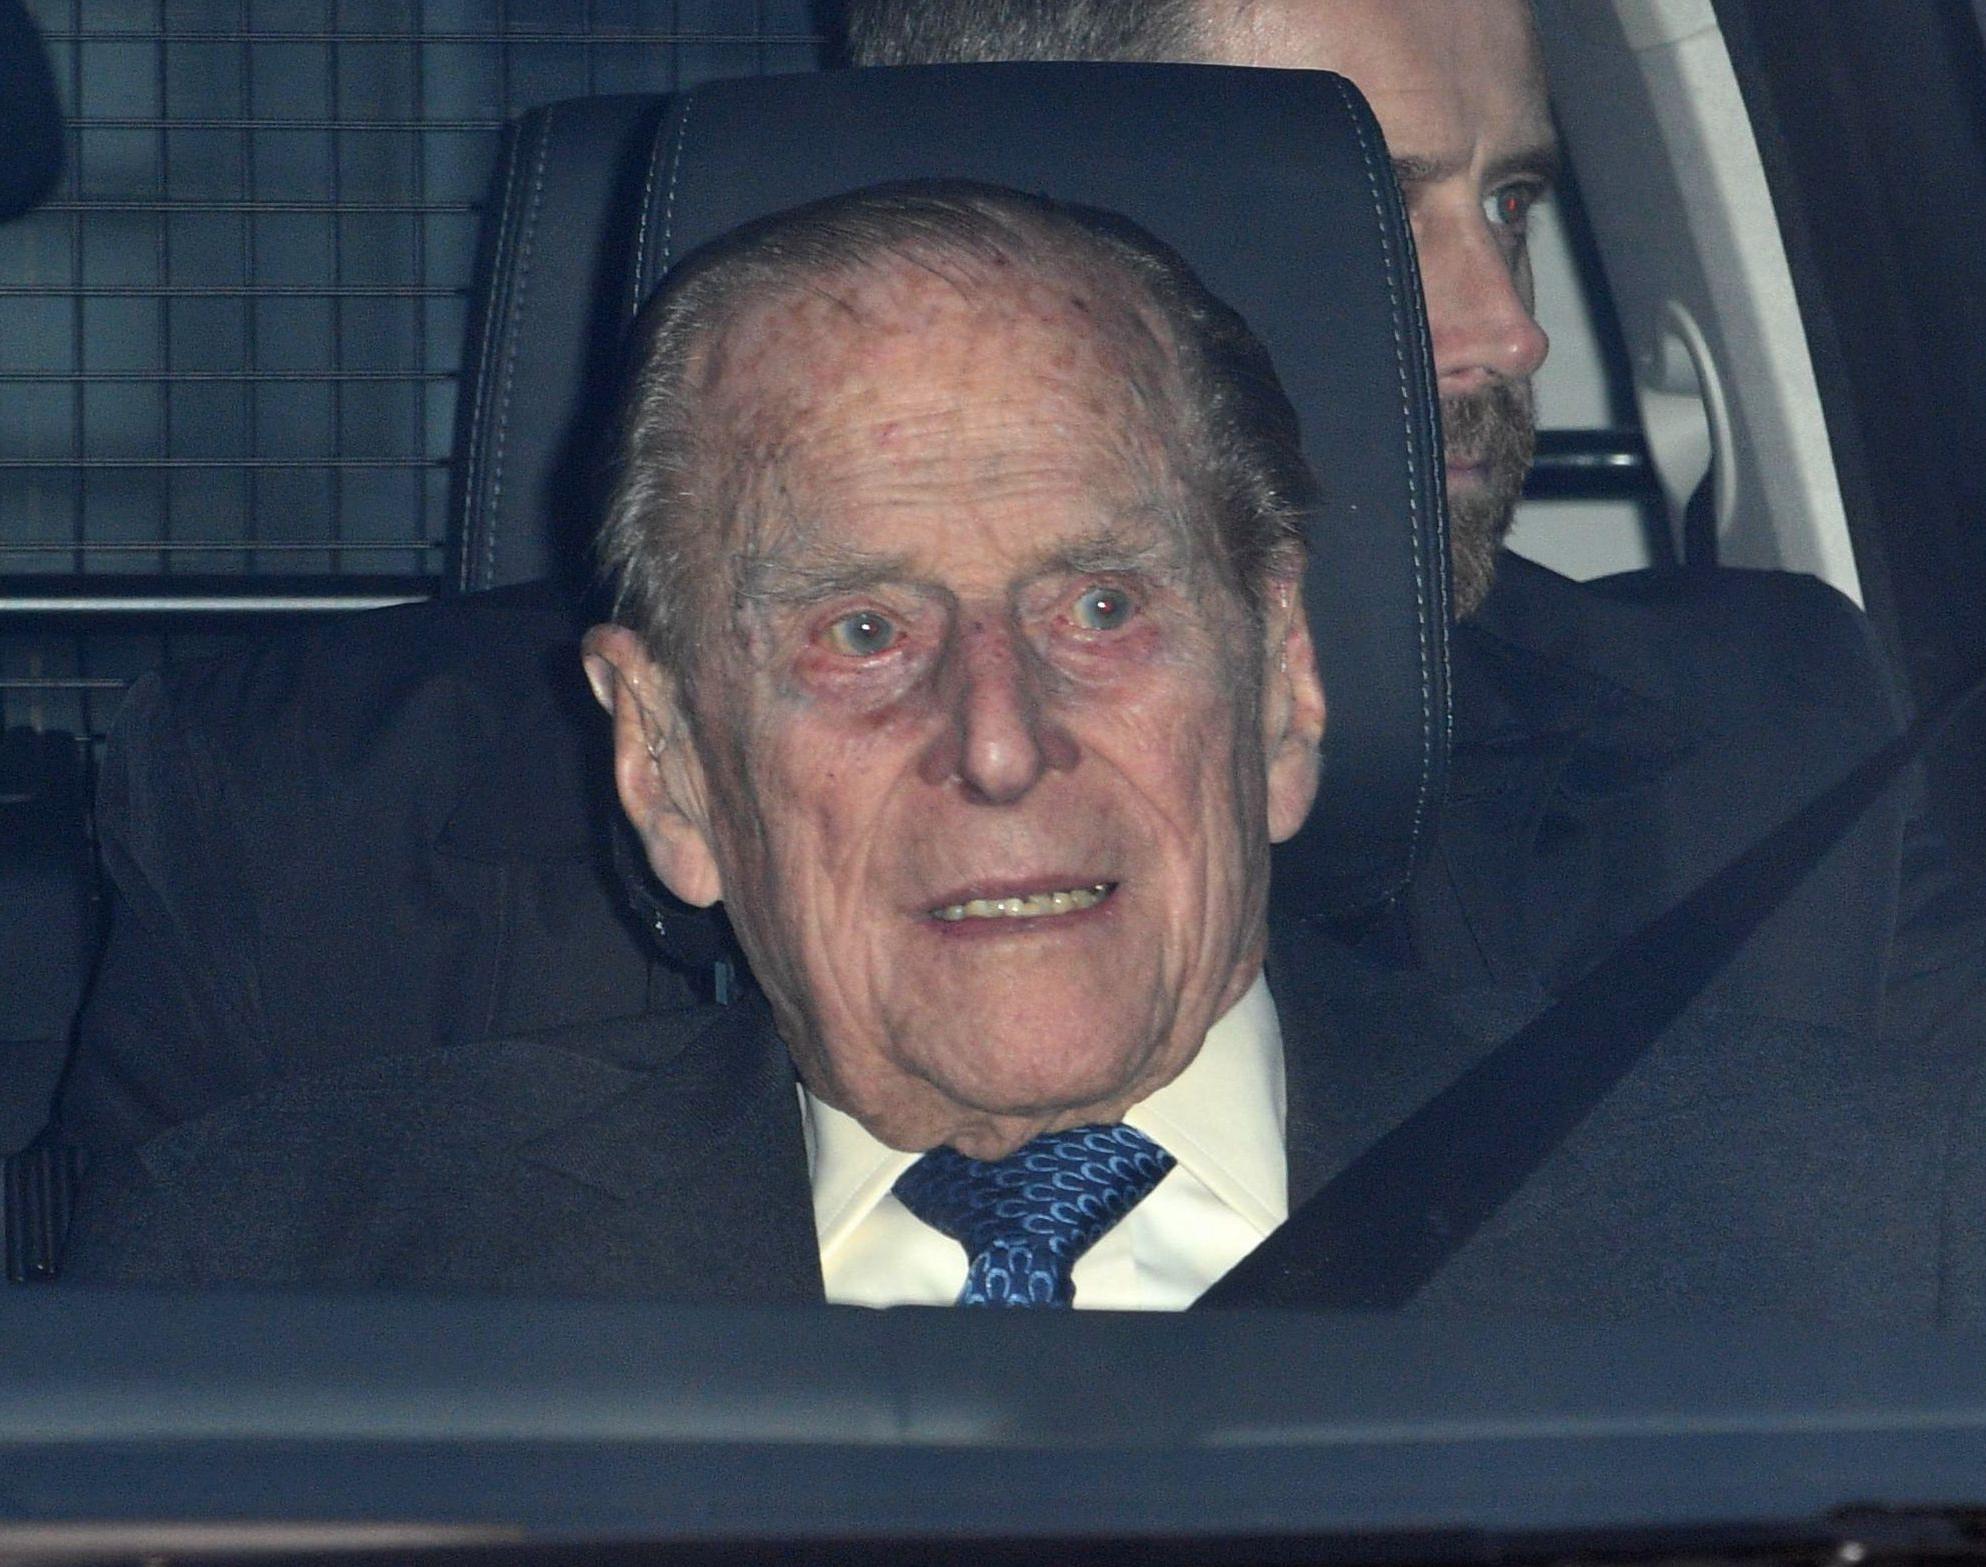 Prince Philip S Reaction Following Sandringham Crash